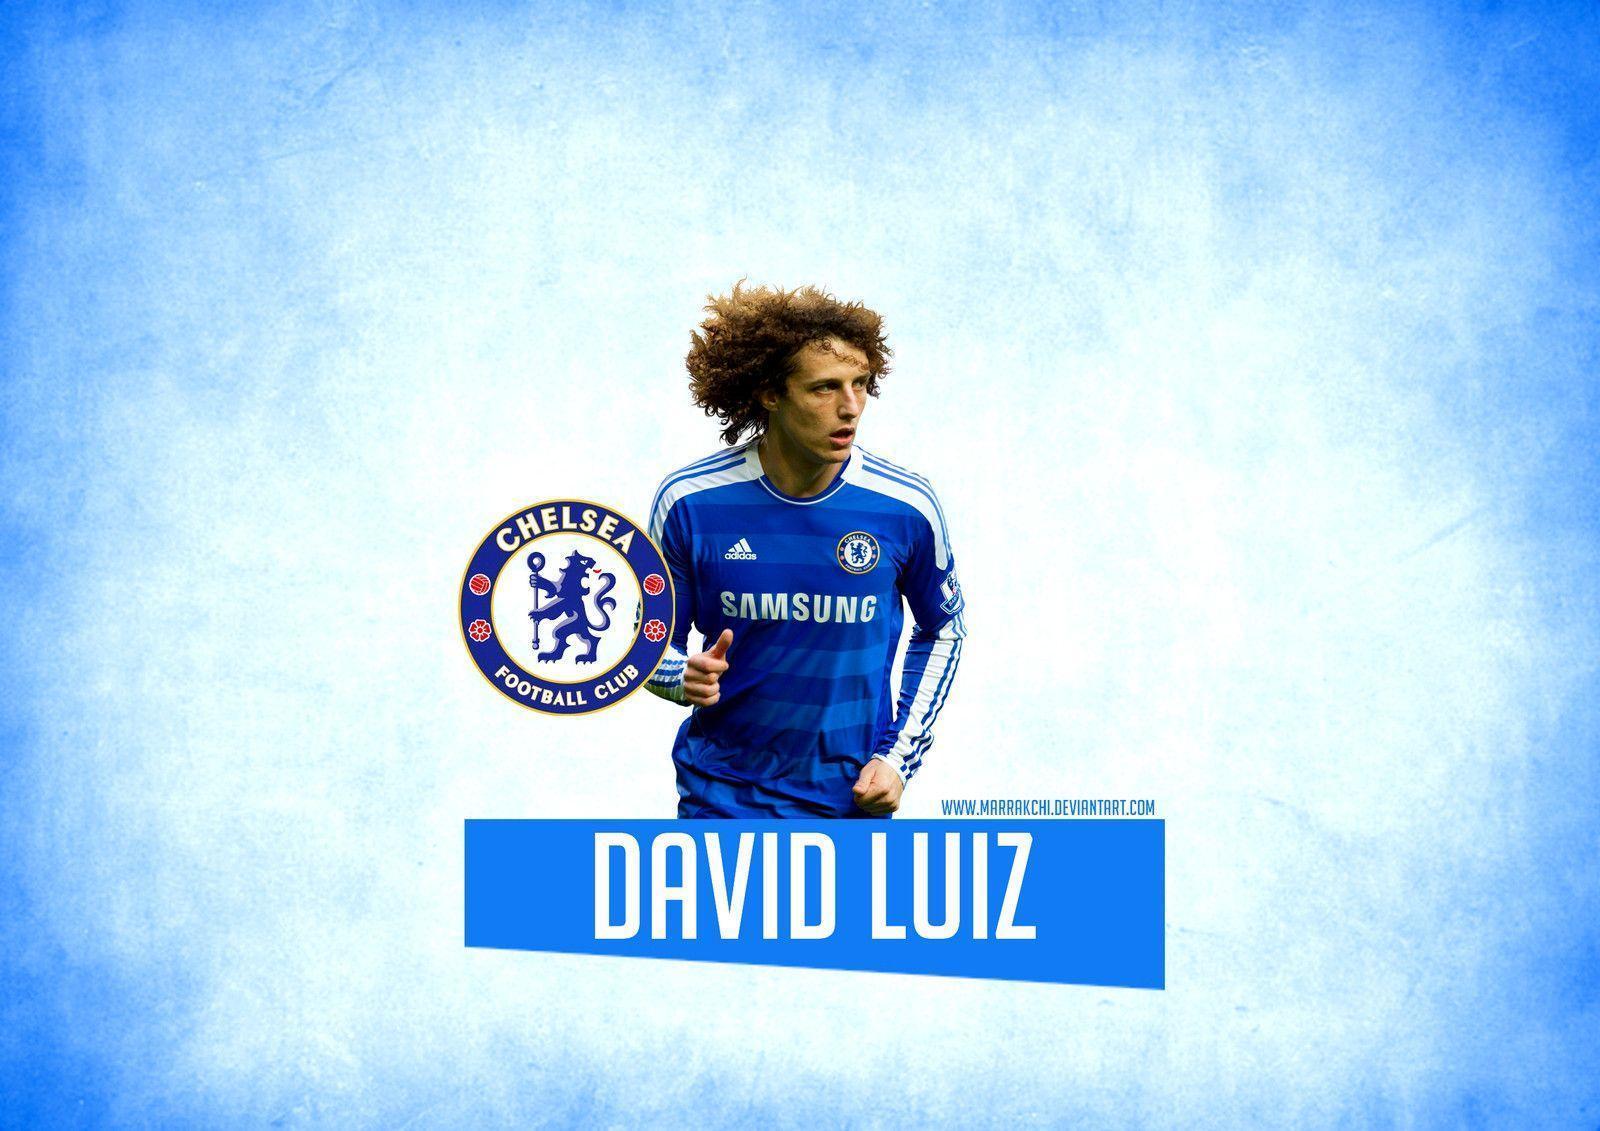 David Luiz Wallpapers 2016 HD